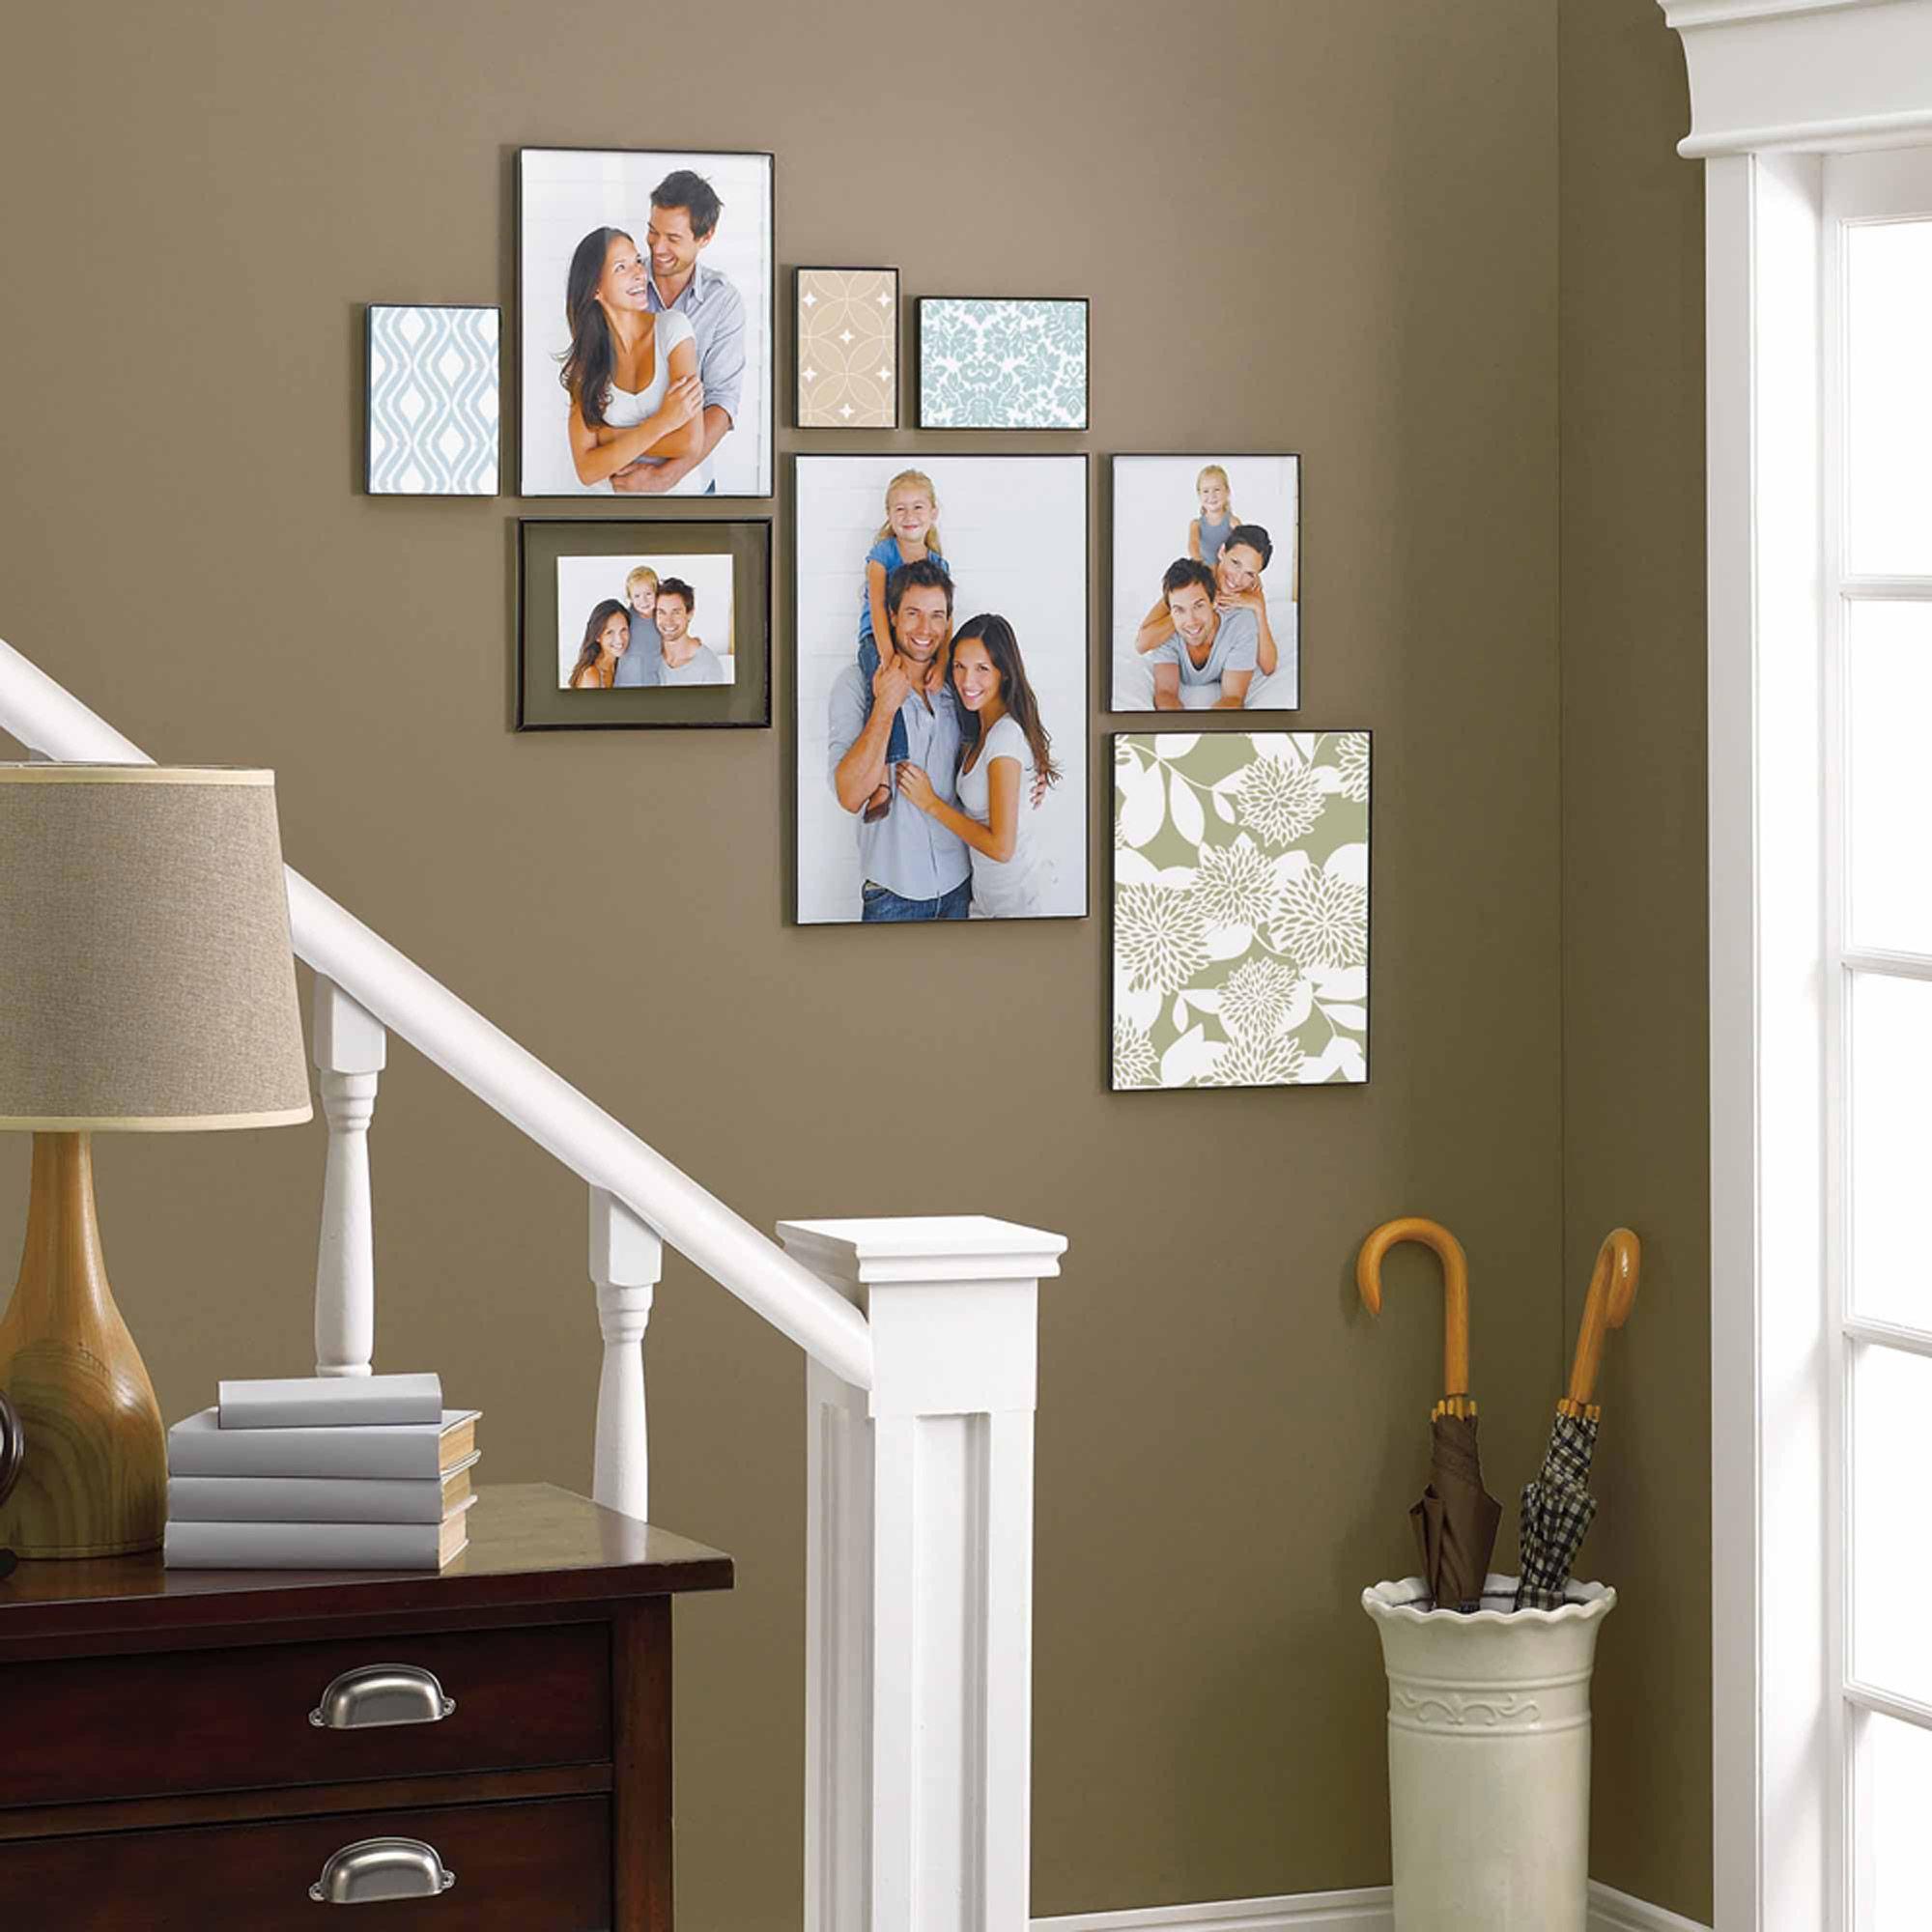 Mainstays 10 X 13 10 25 X 25 X 13 25 Flex Float Frame Black Finish Walmart Com Staircase Wall Decor Photo Wall Decor Decor